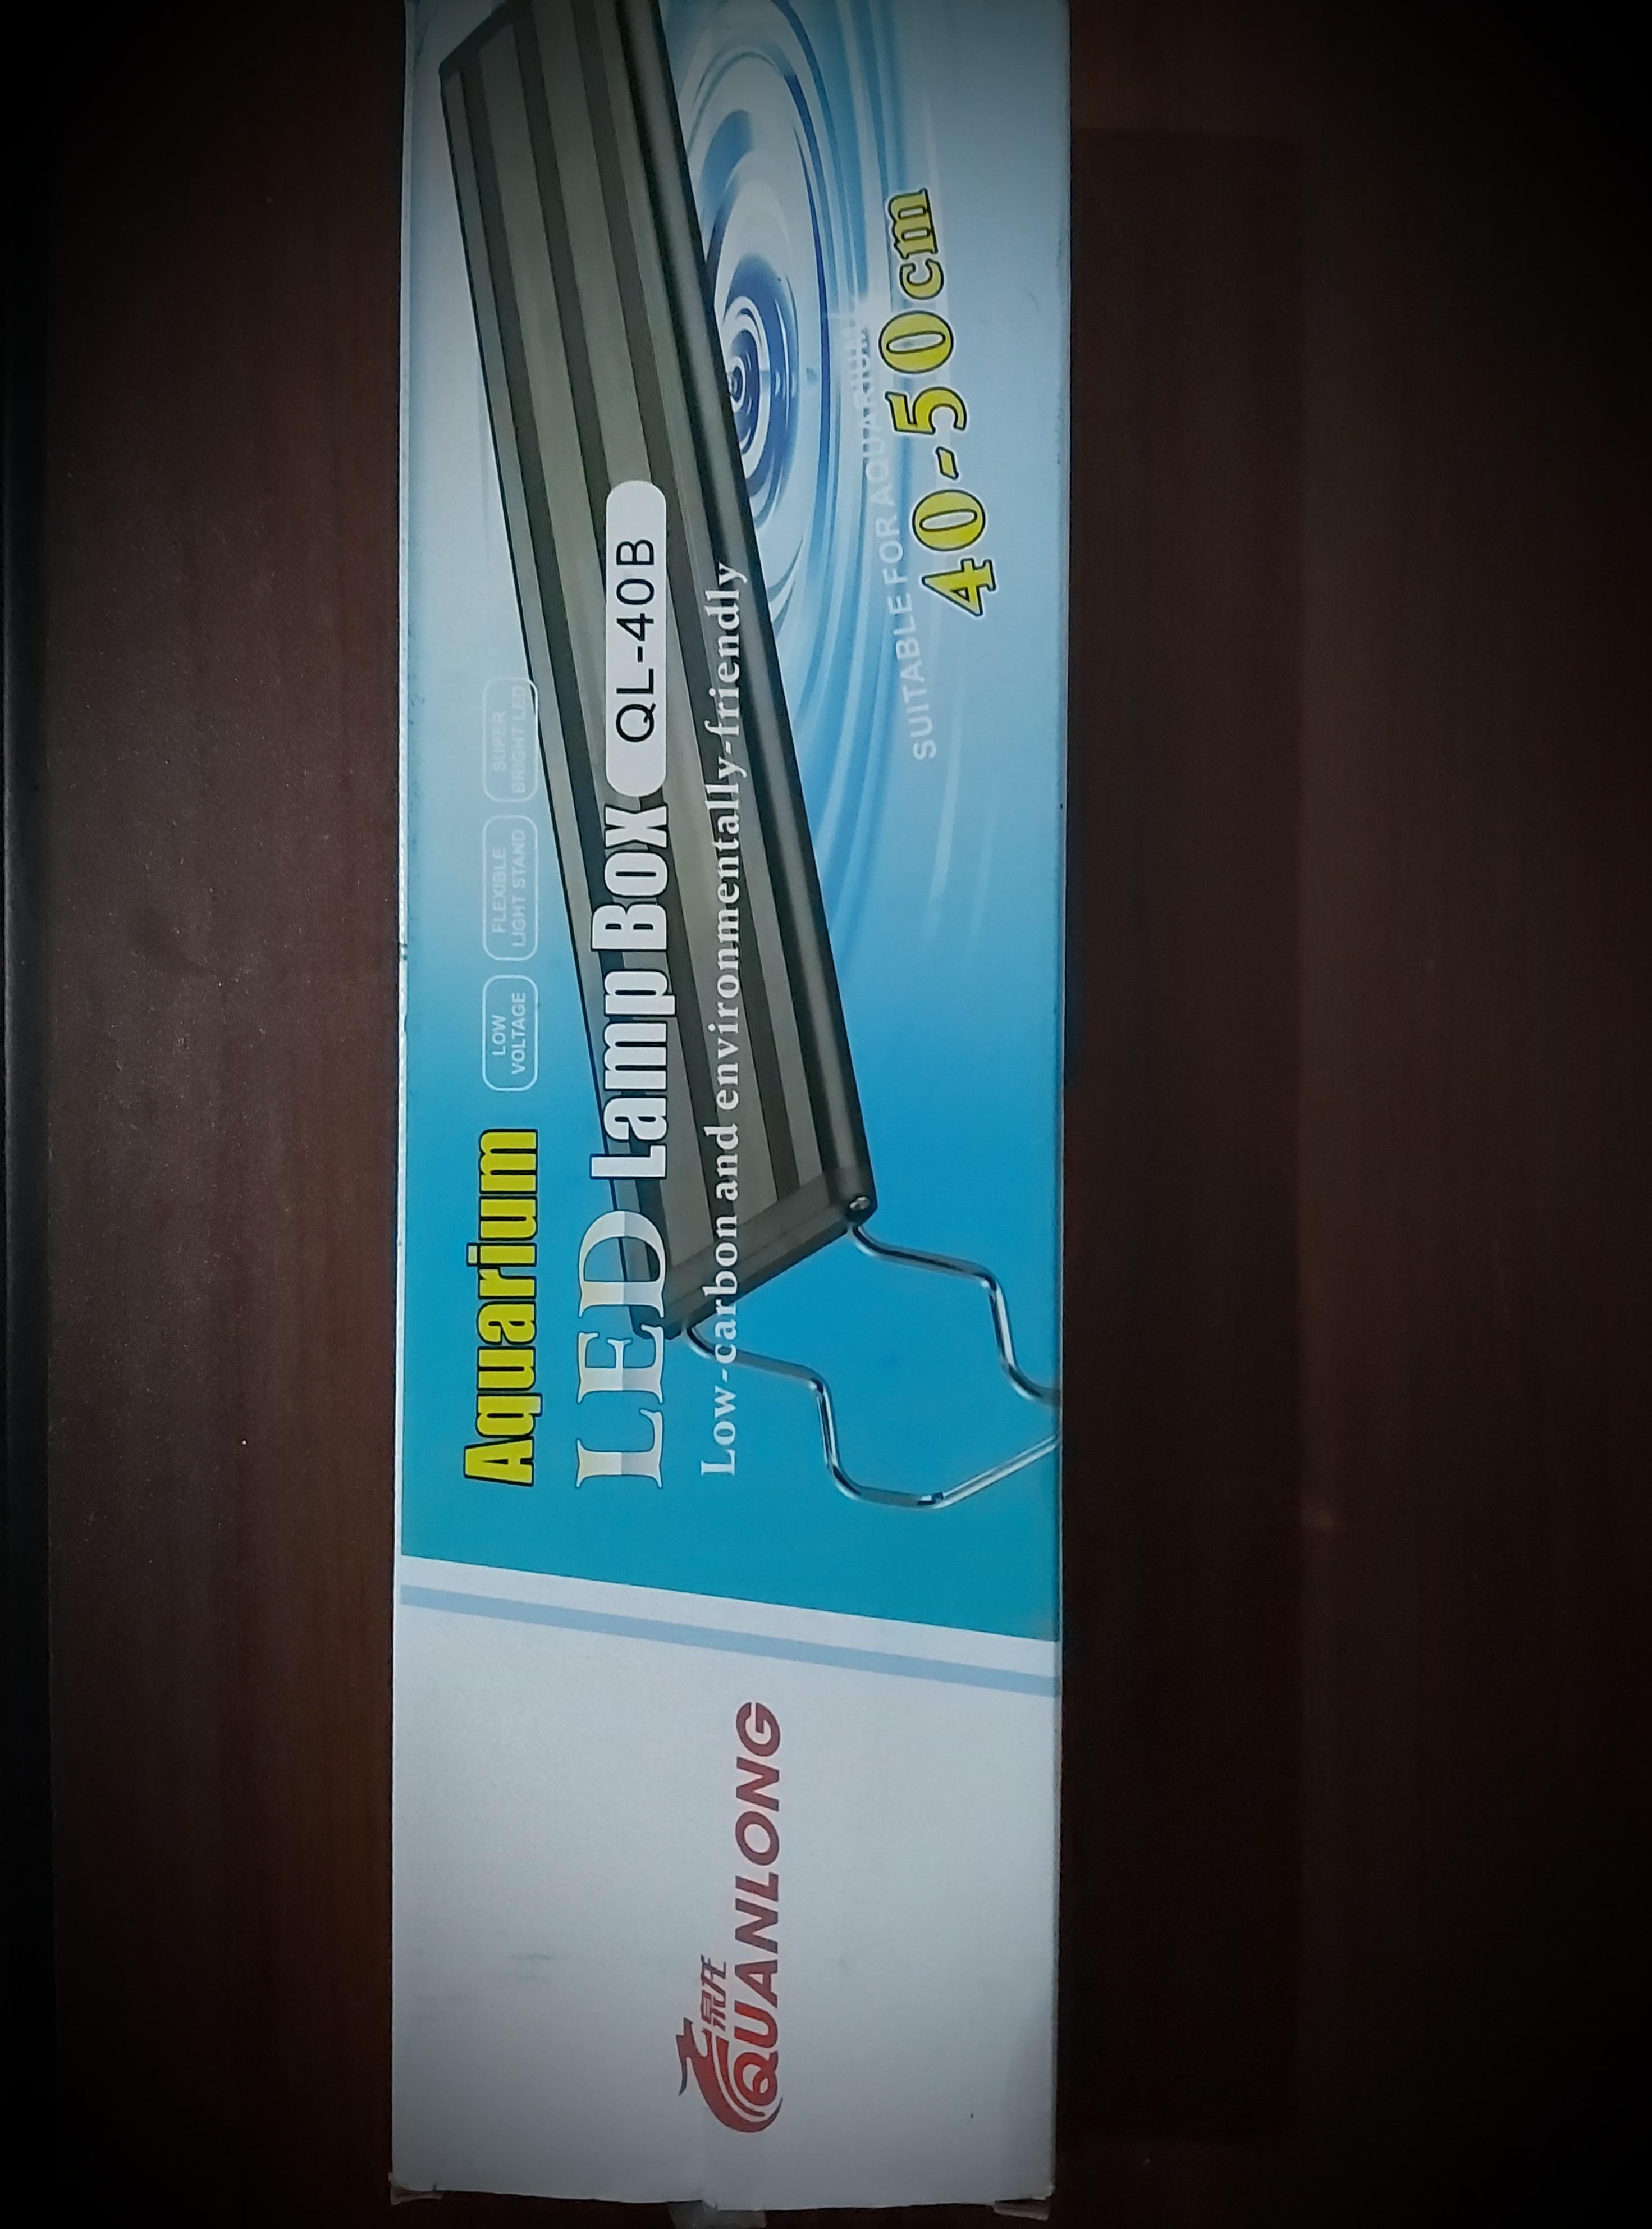 Quanlong QL40B LED Light (1-1.5ft)